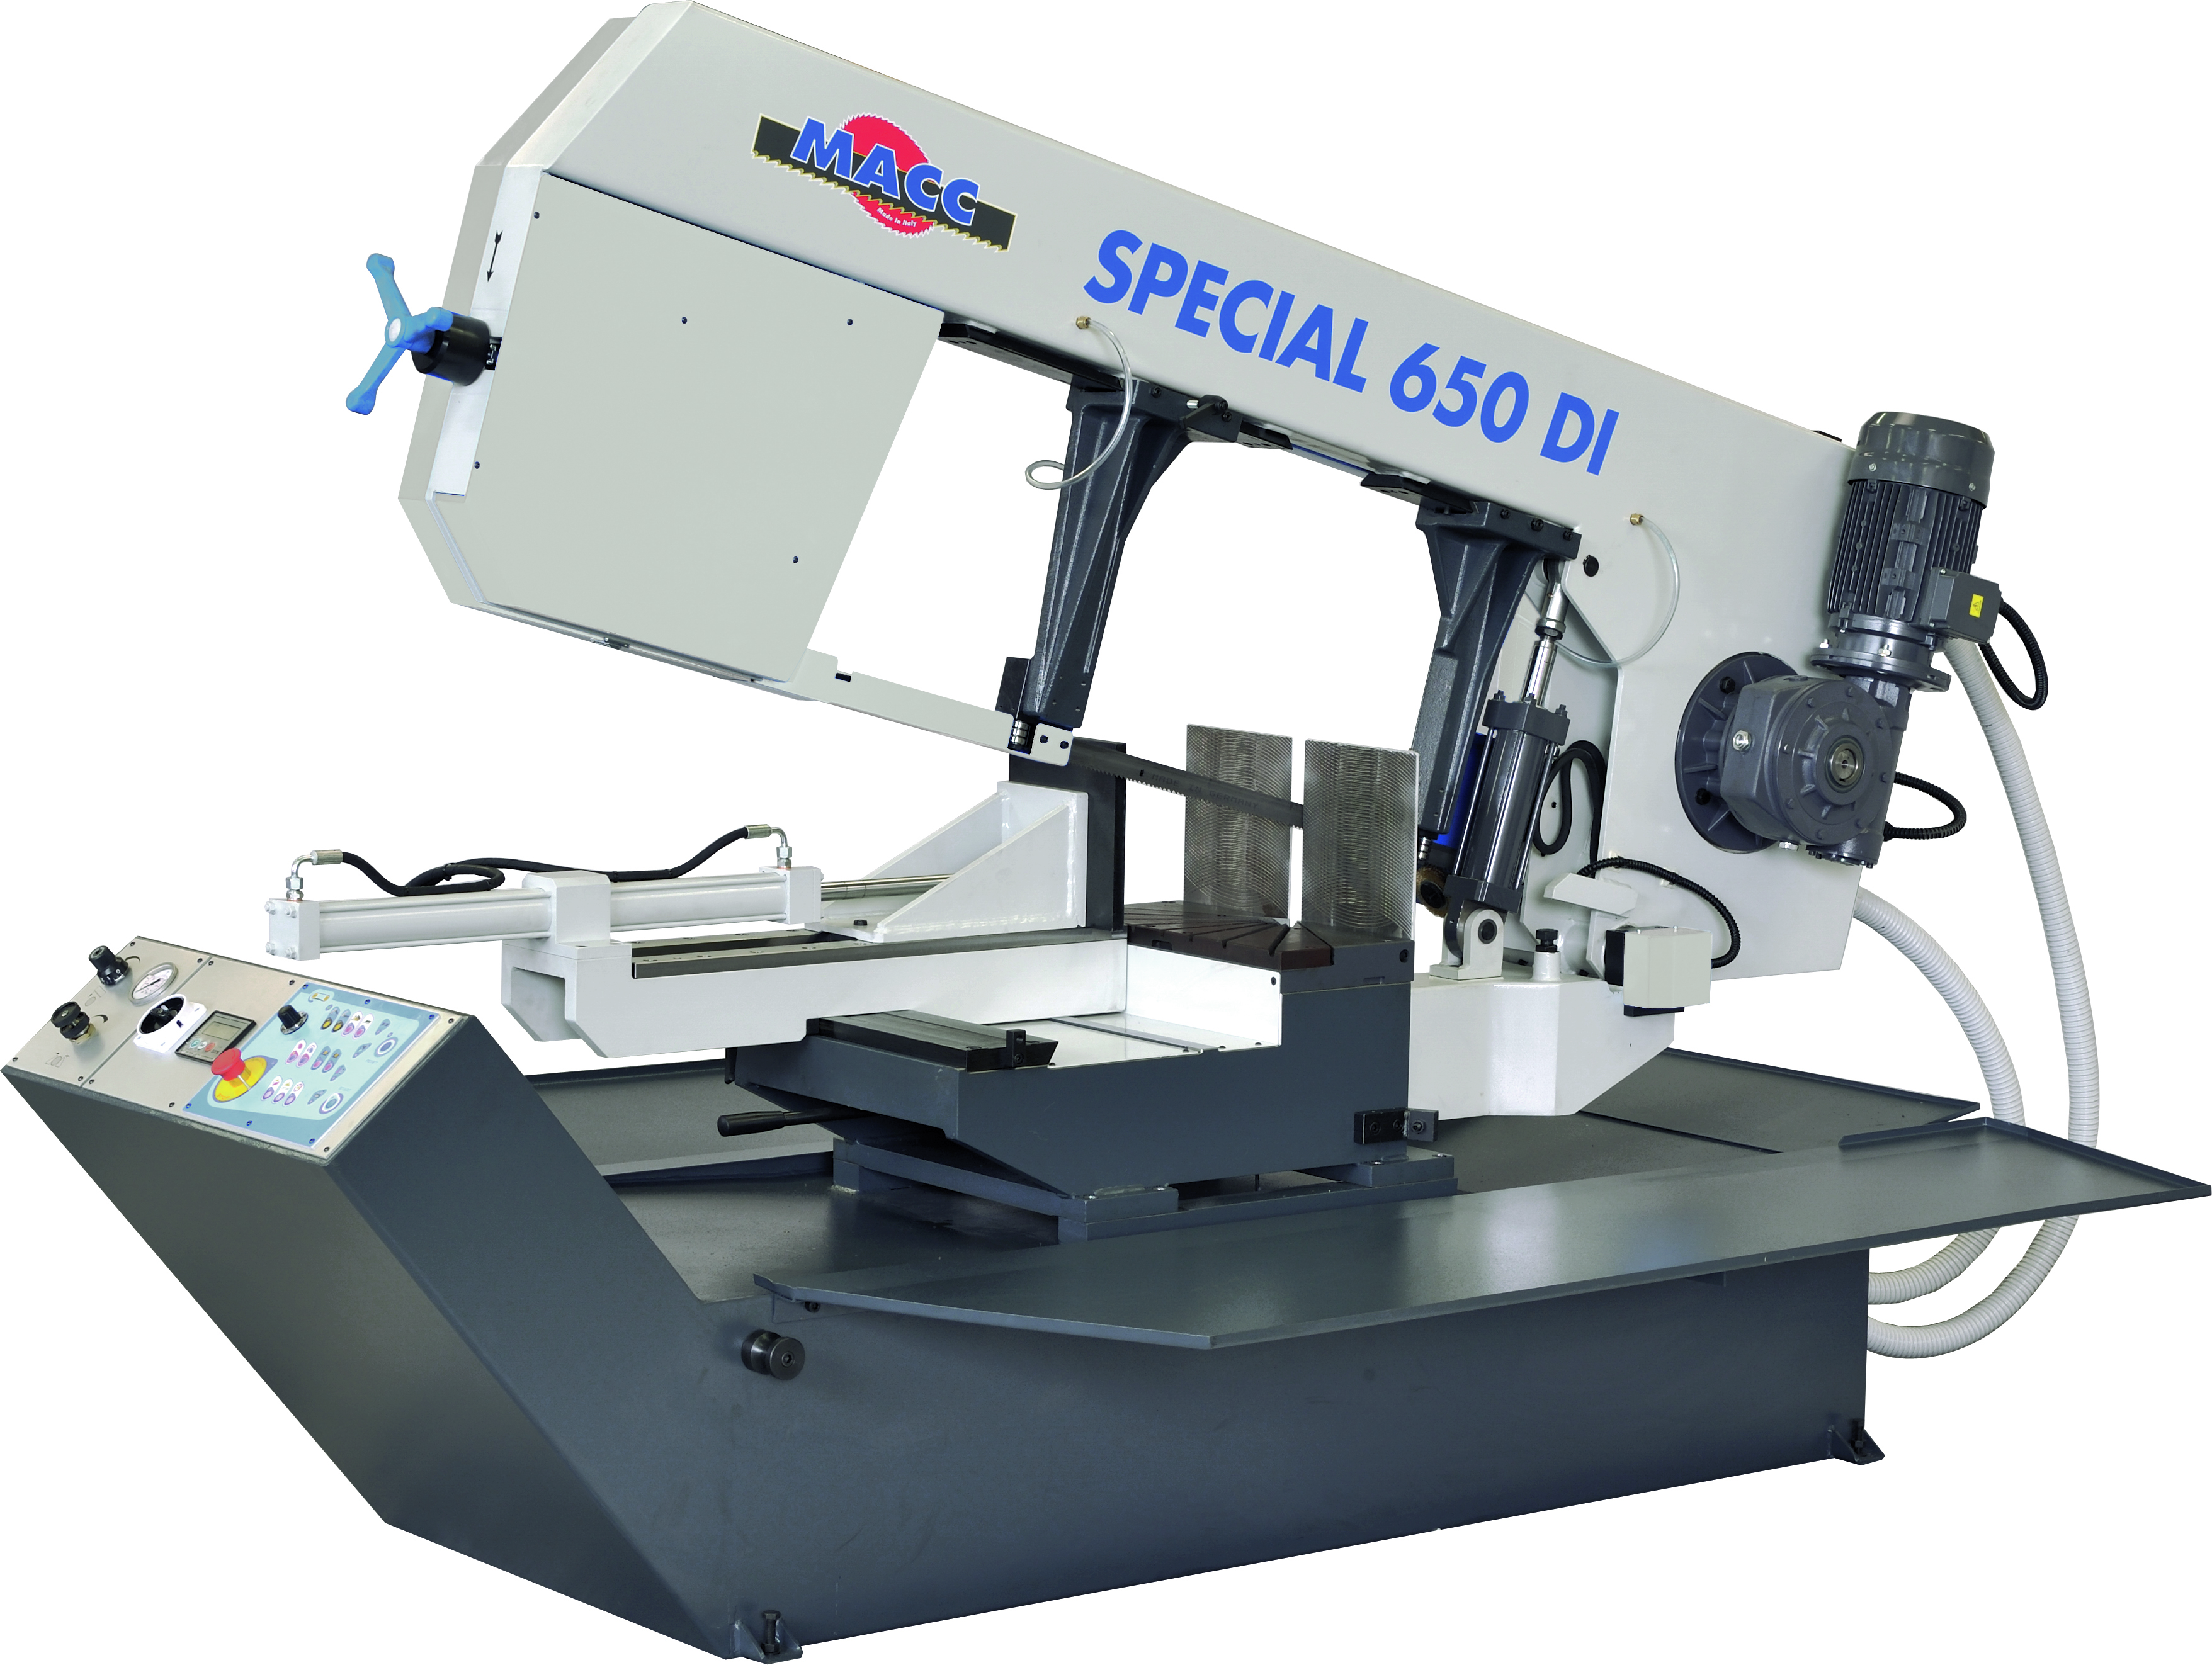 Special 650 DI Bandsaw